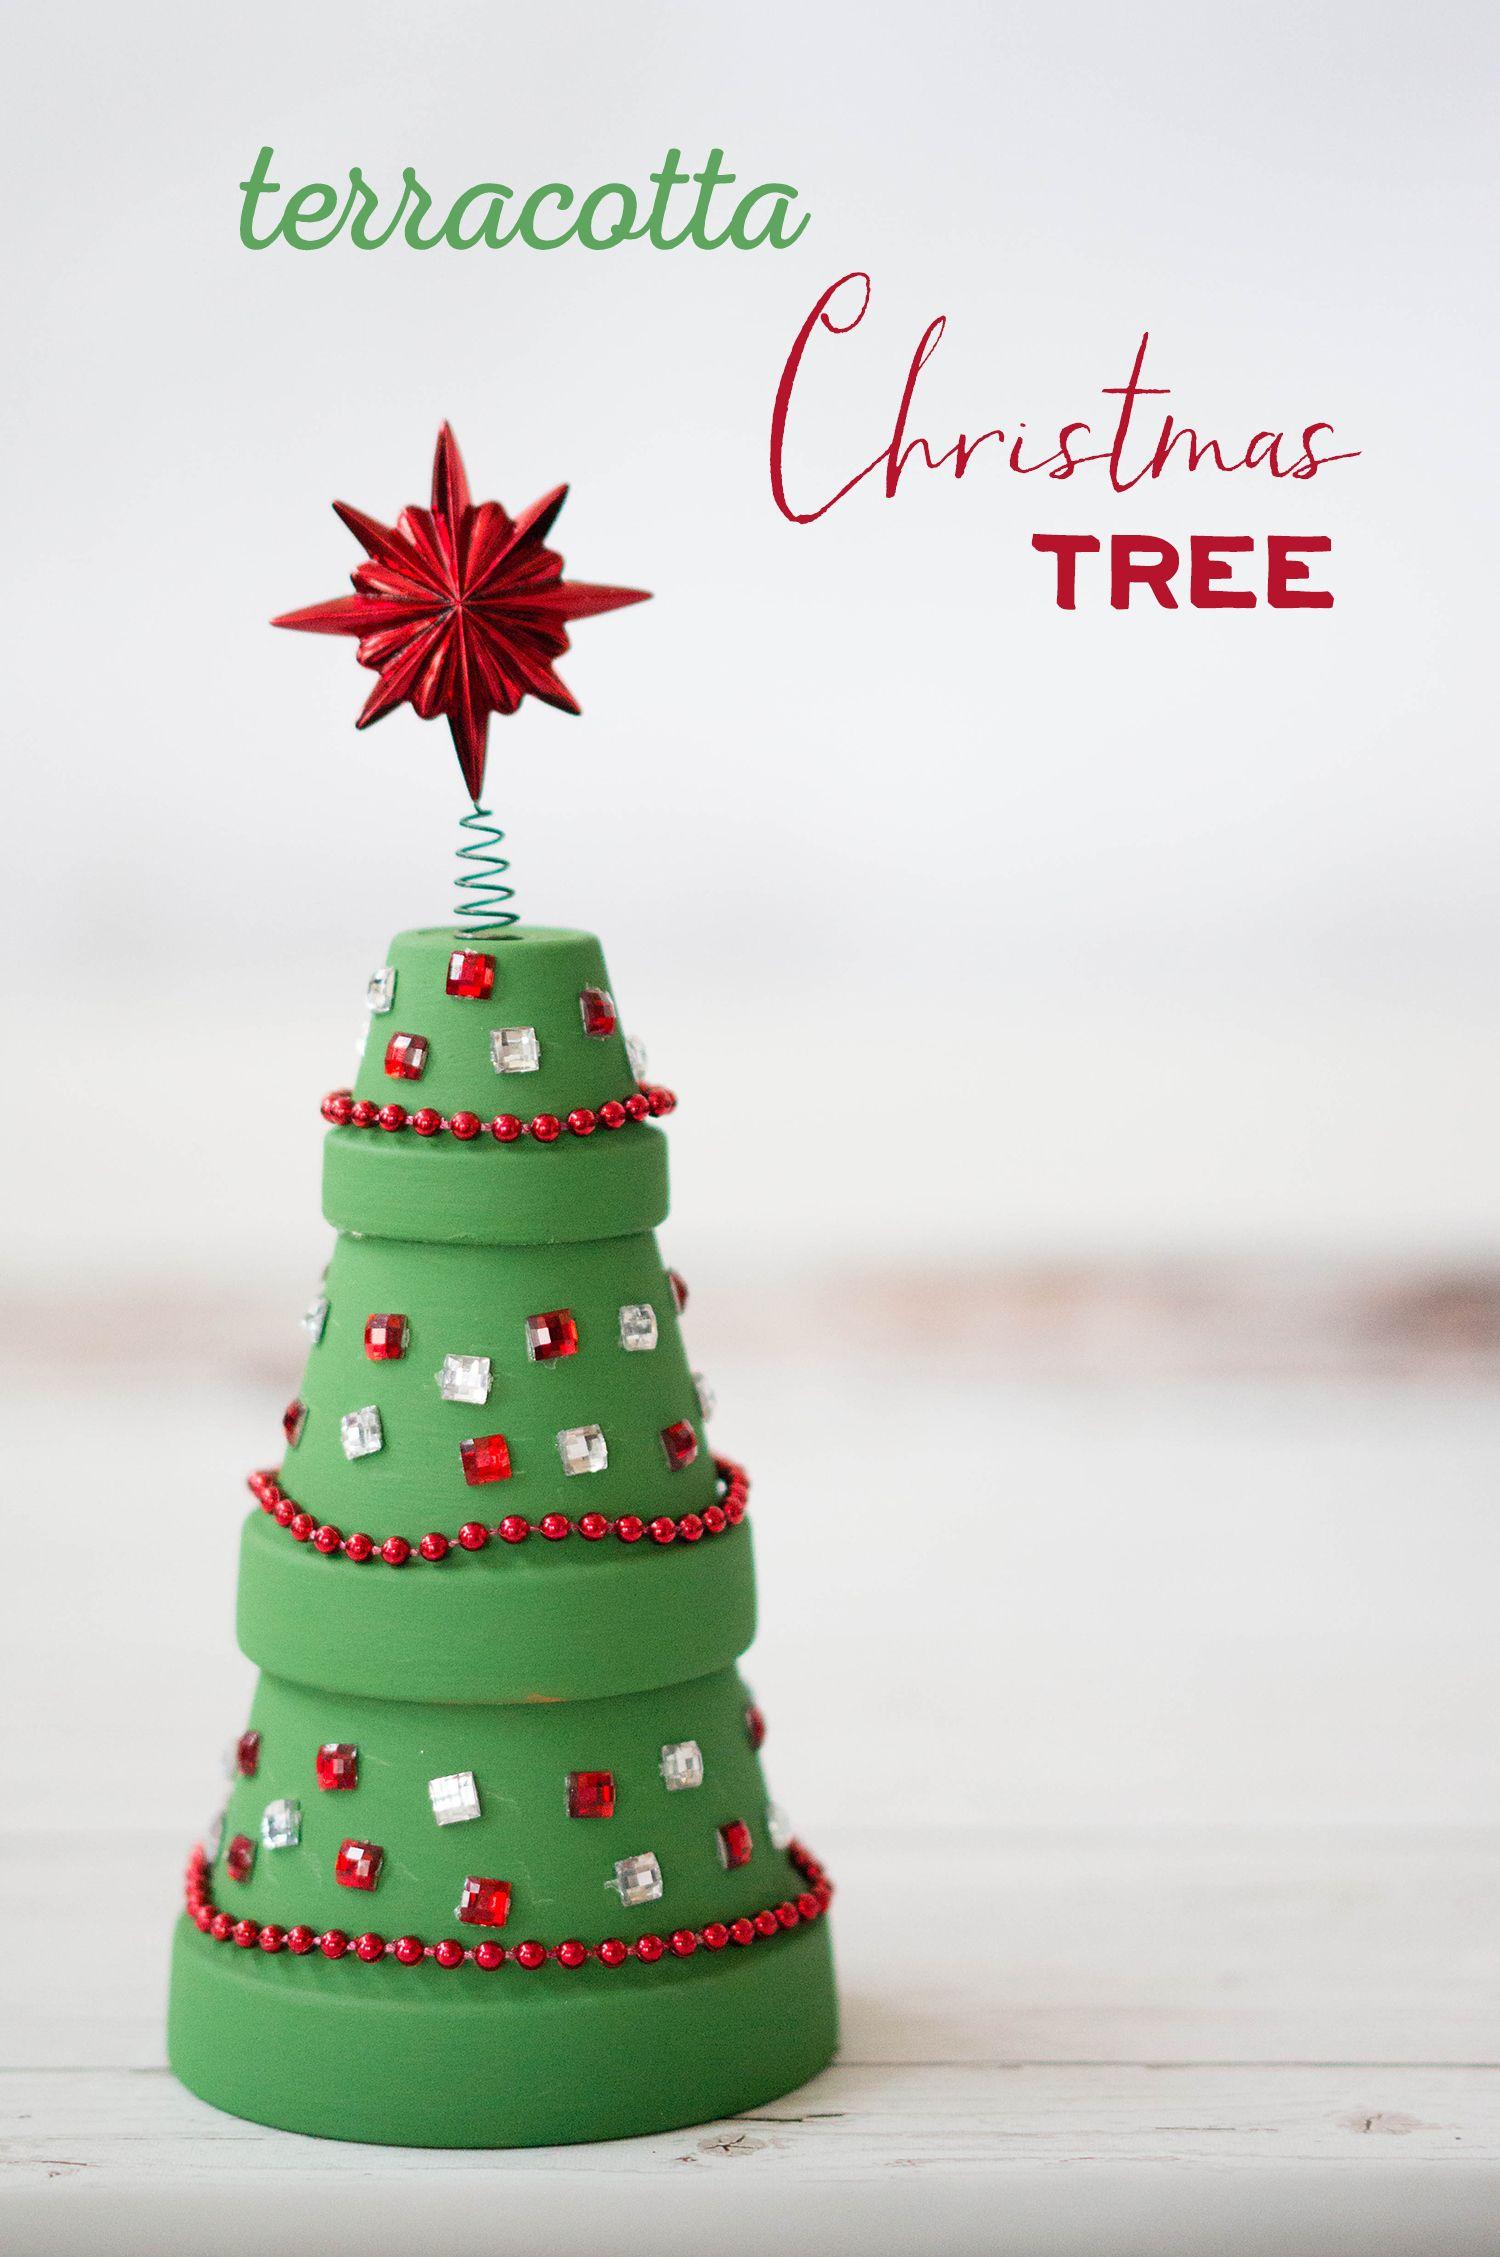 Mrs potts chip christmas decoration - Terracotta Christmas Tree